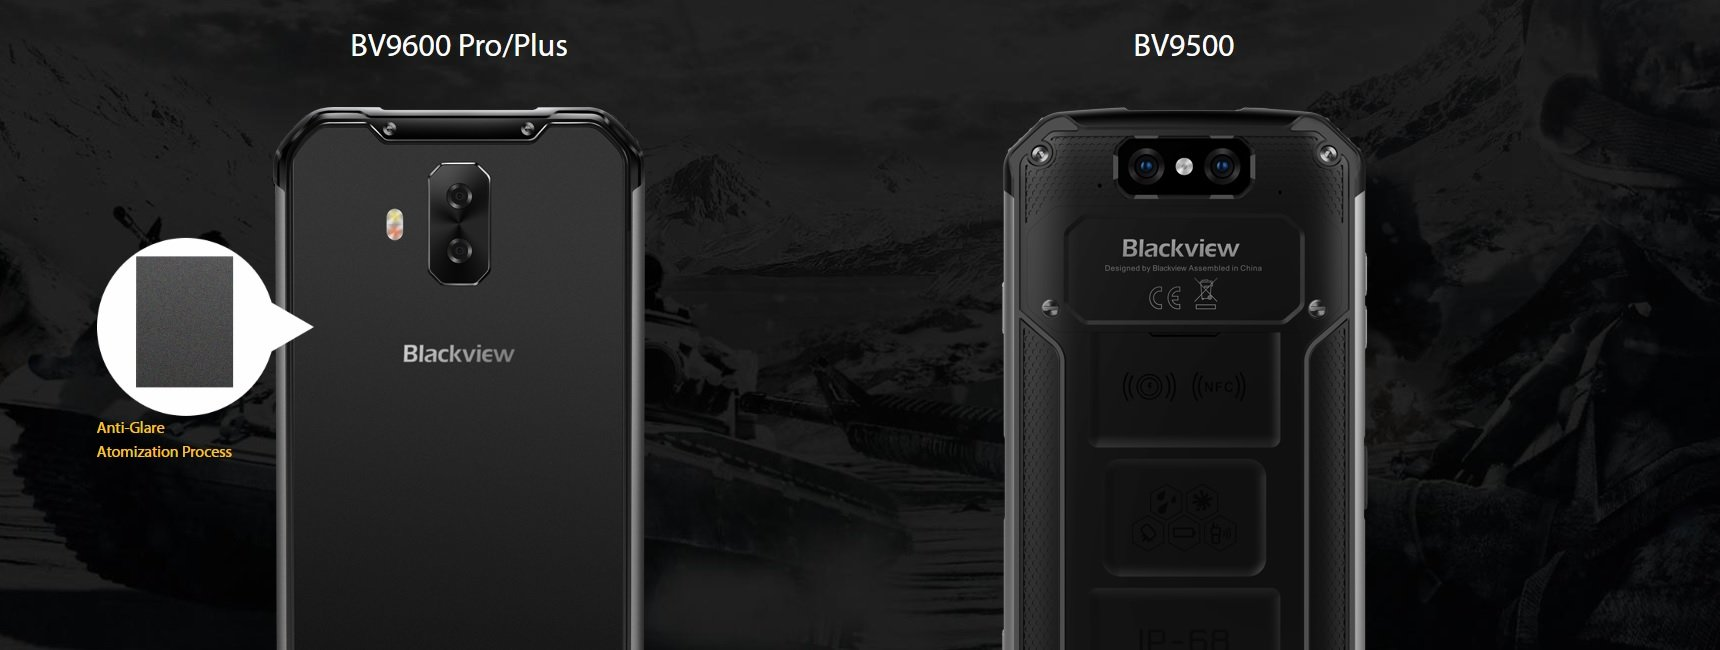 Blackview BV9600 Pro/Plus - Chinahandys net